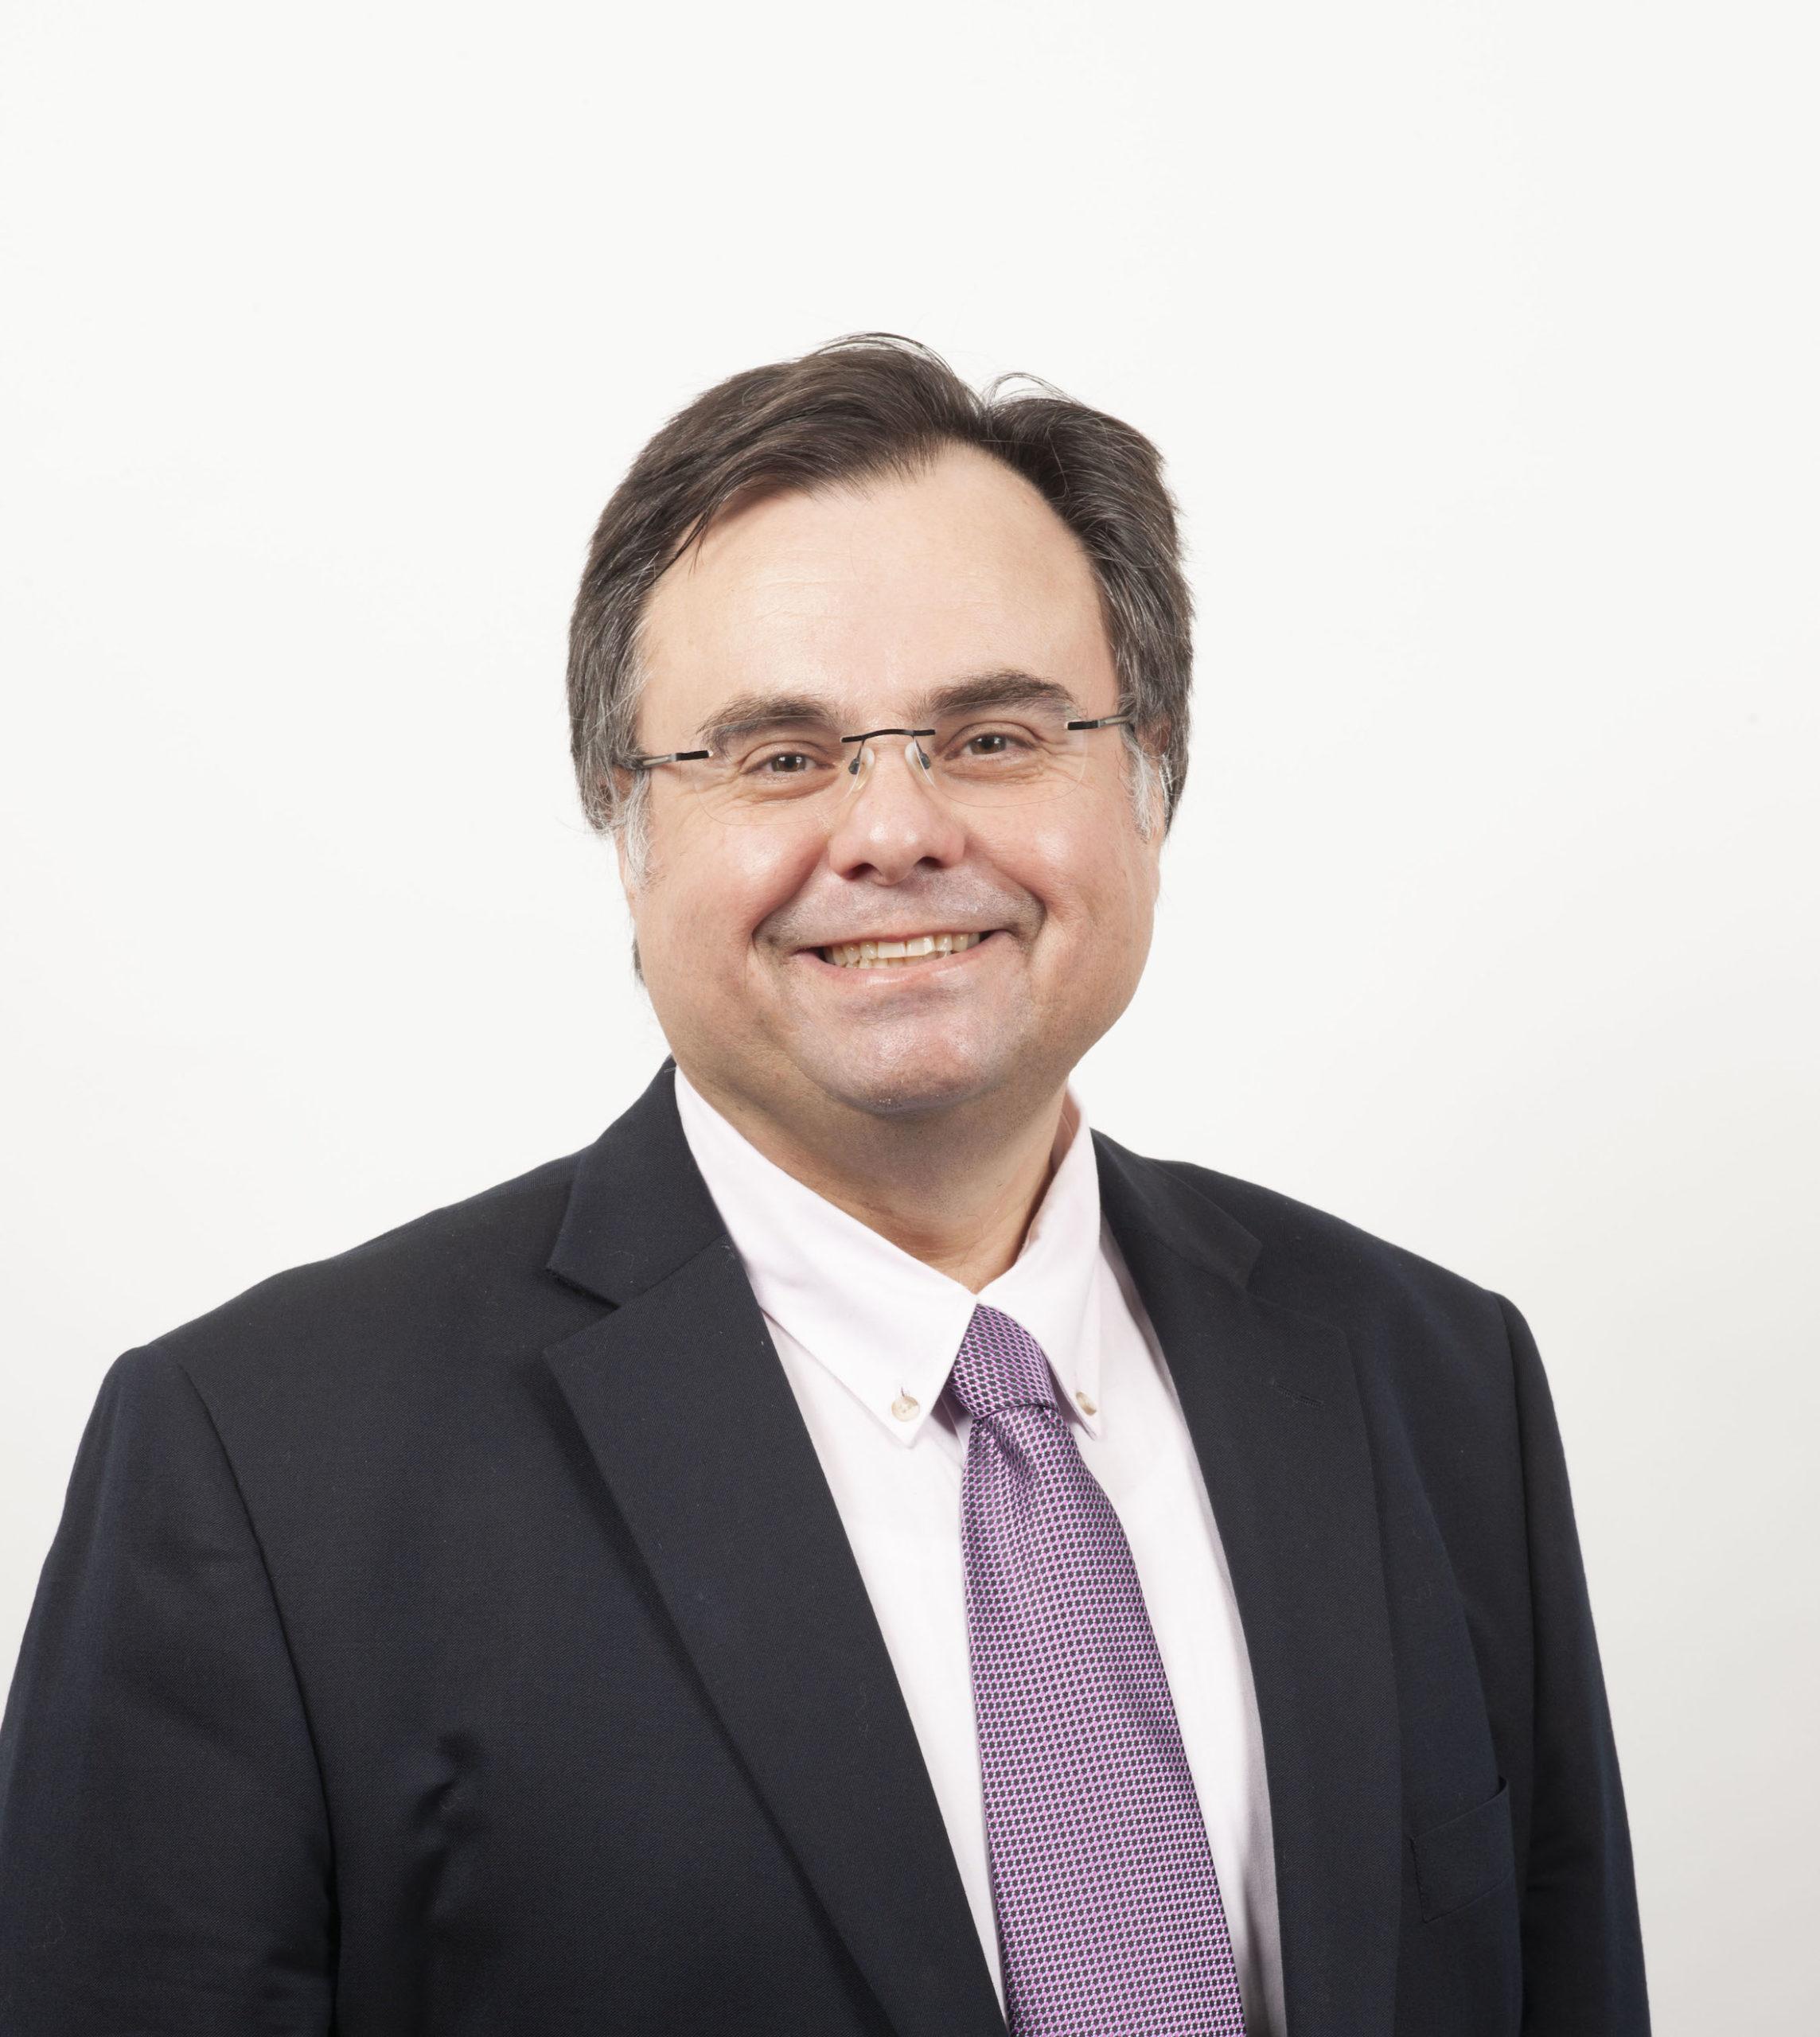 Prof. Dimitrios Buhalis, Bournemouth University, UK